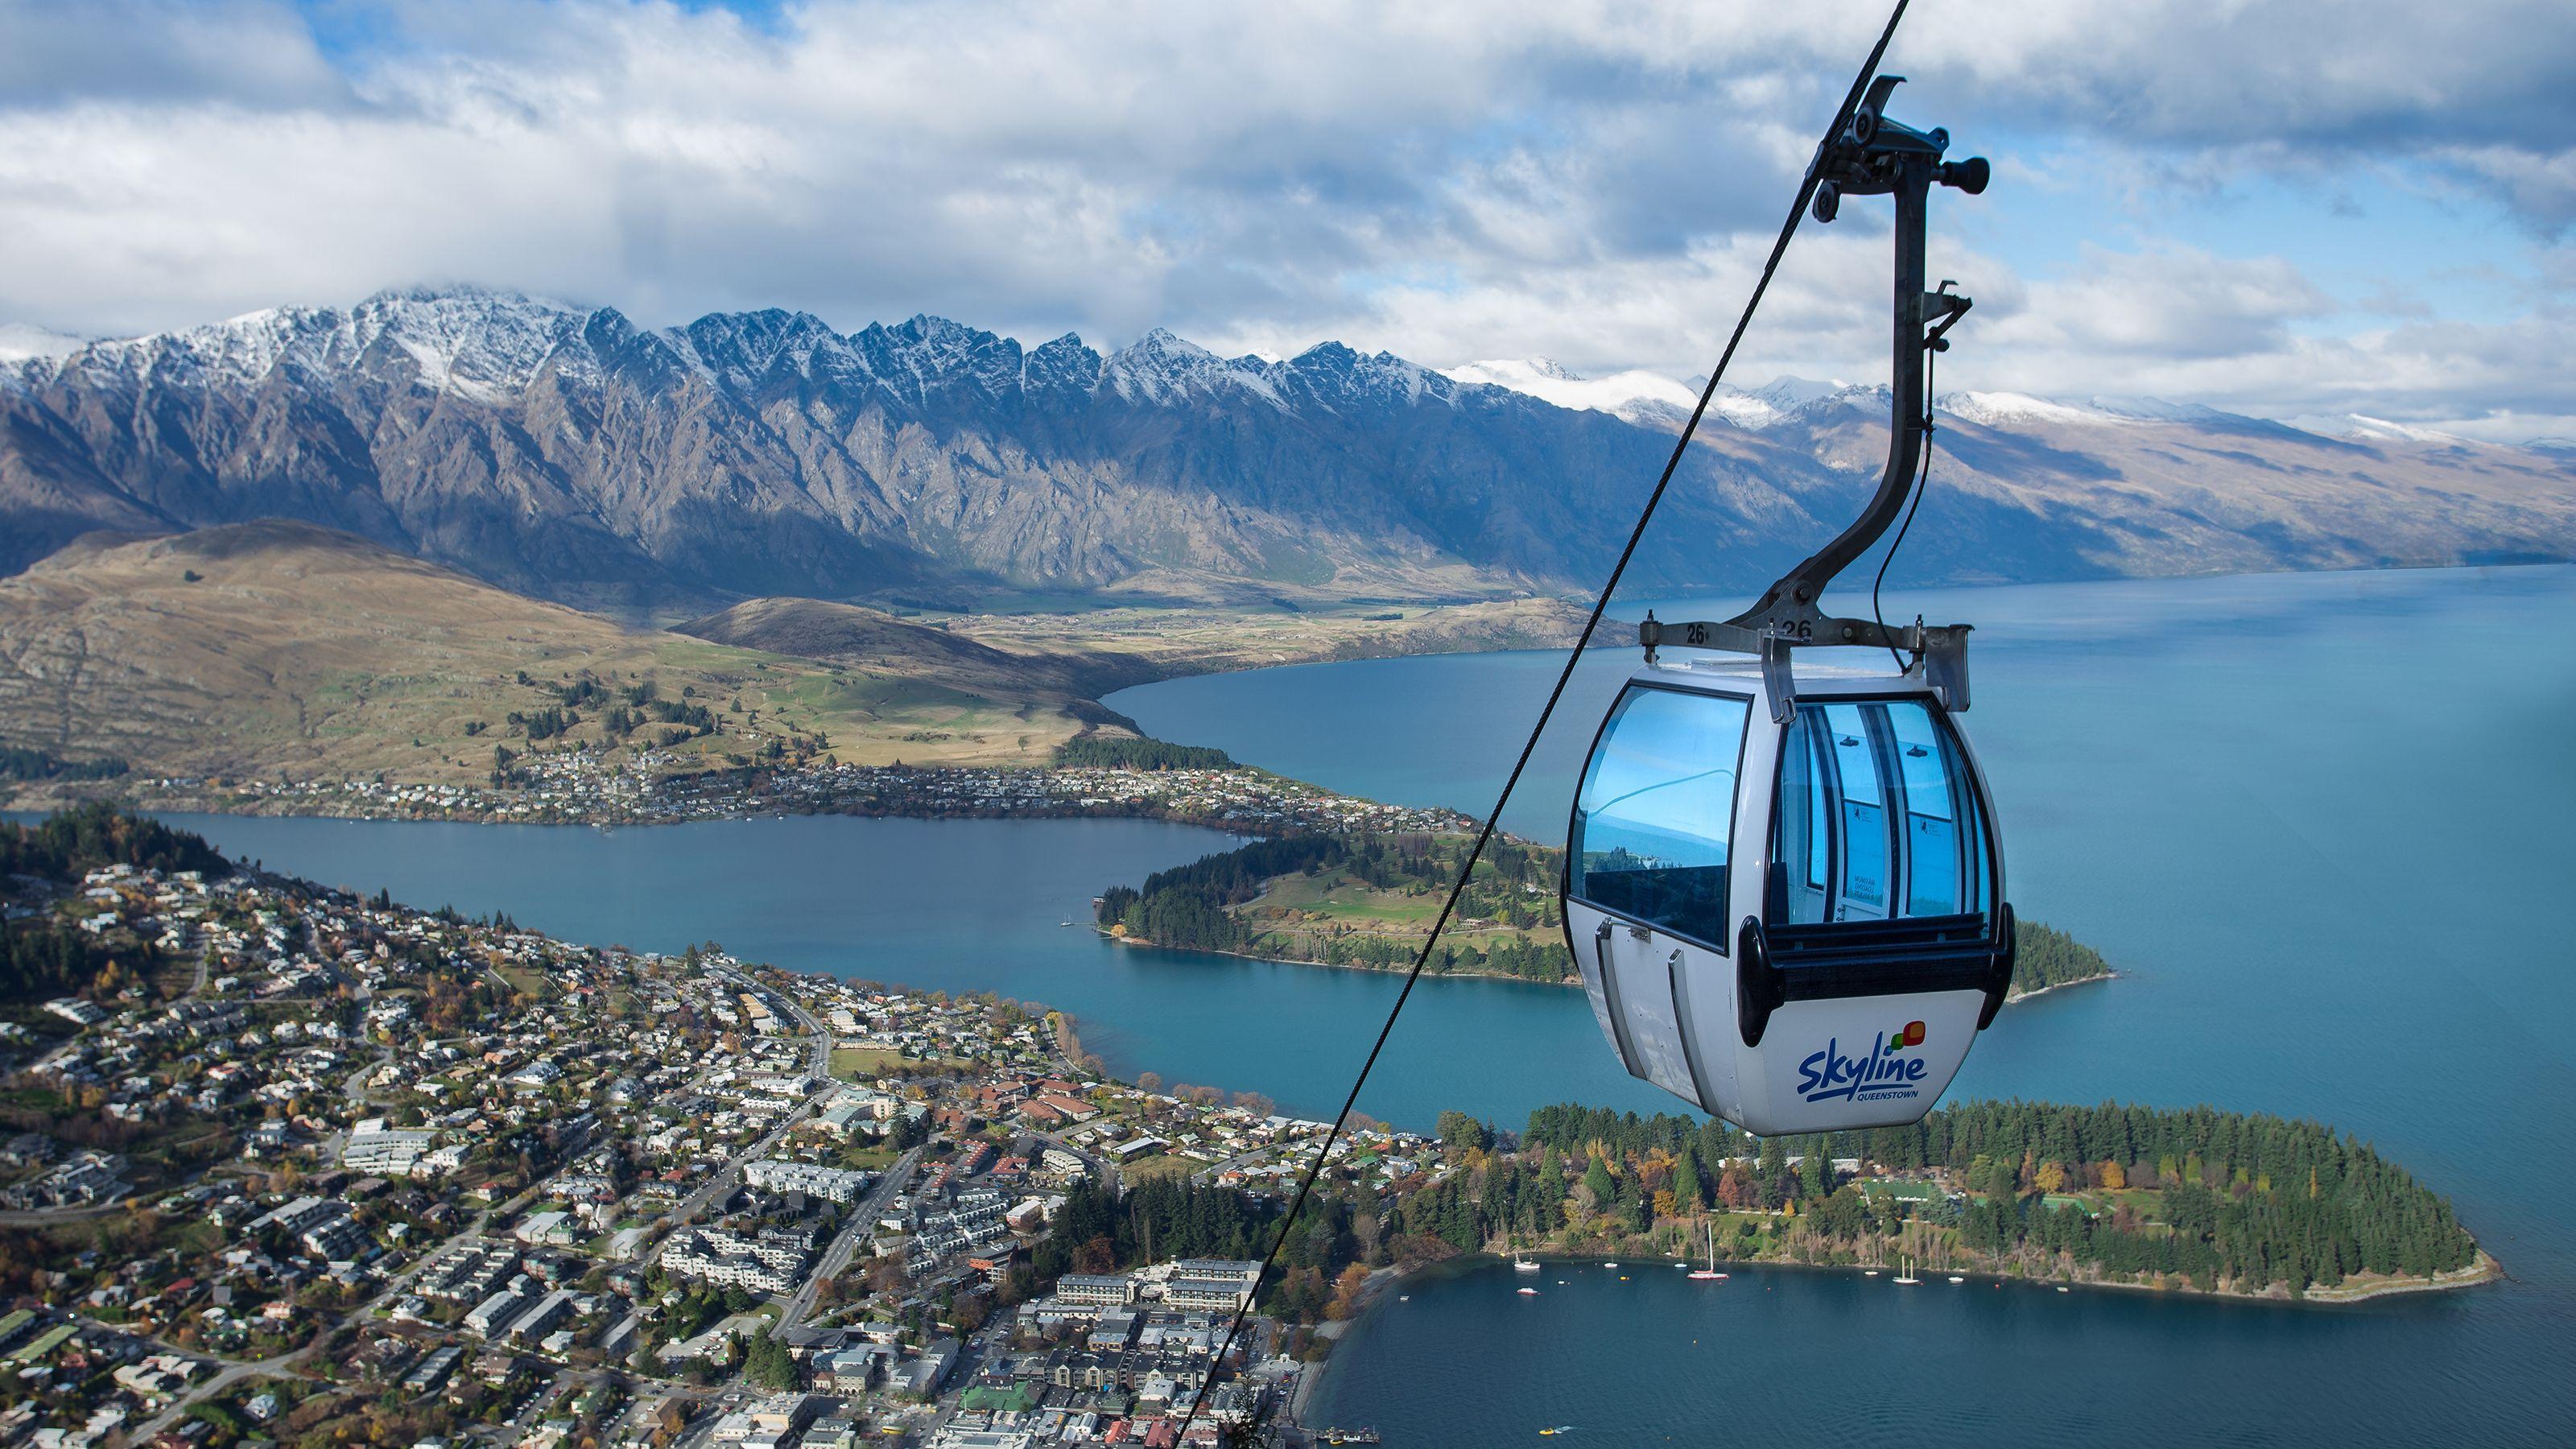 Skyline Gondola Admission